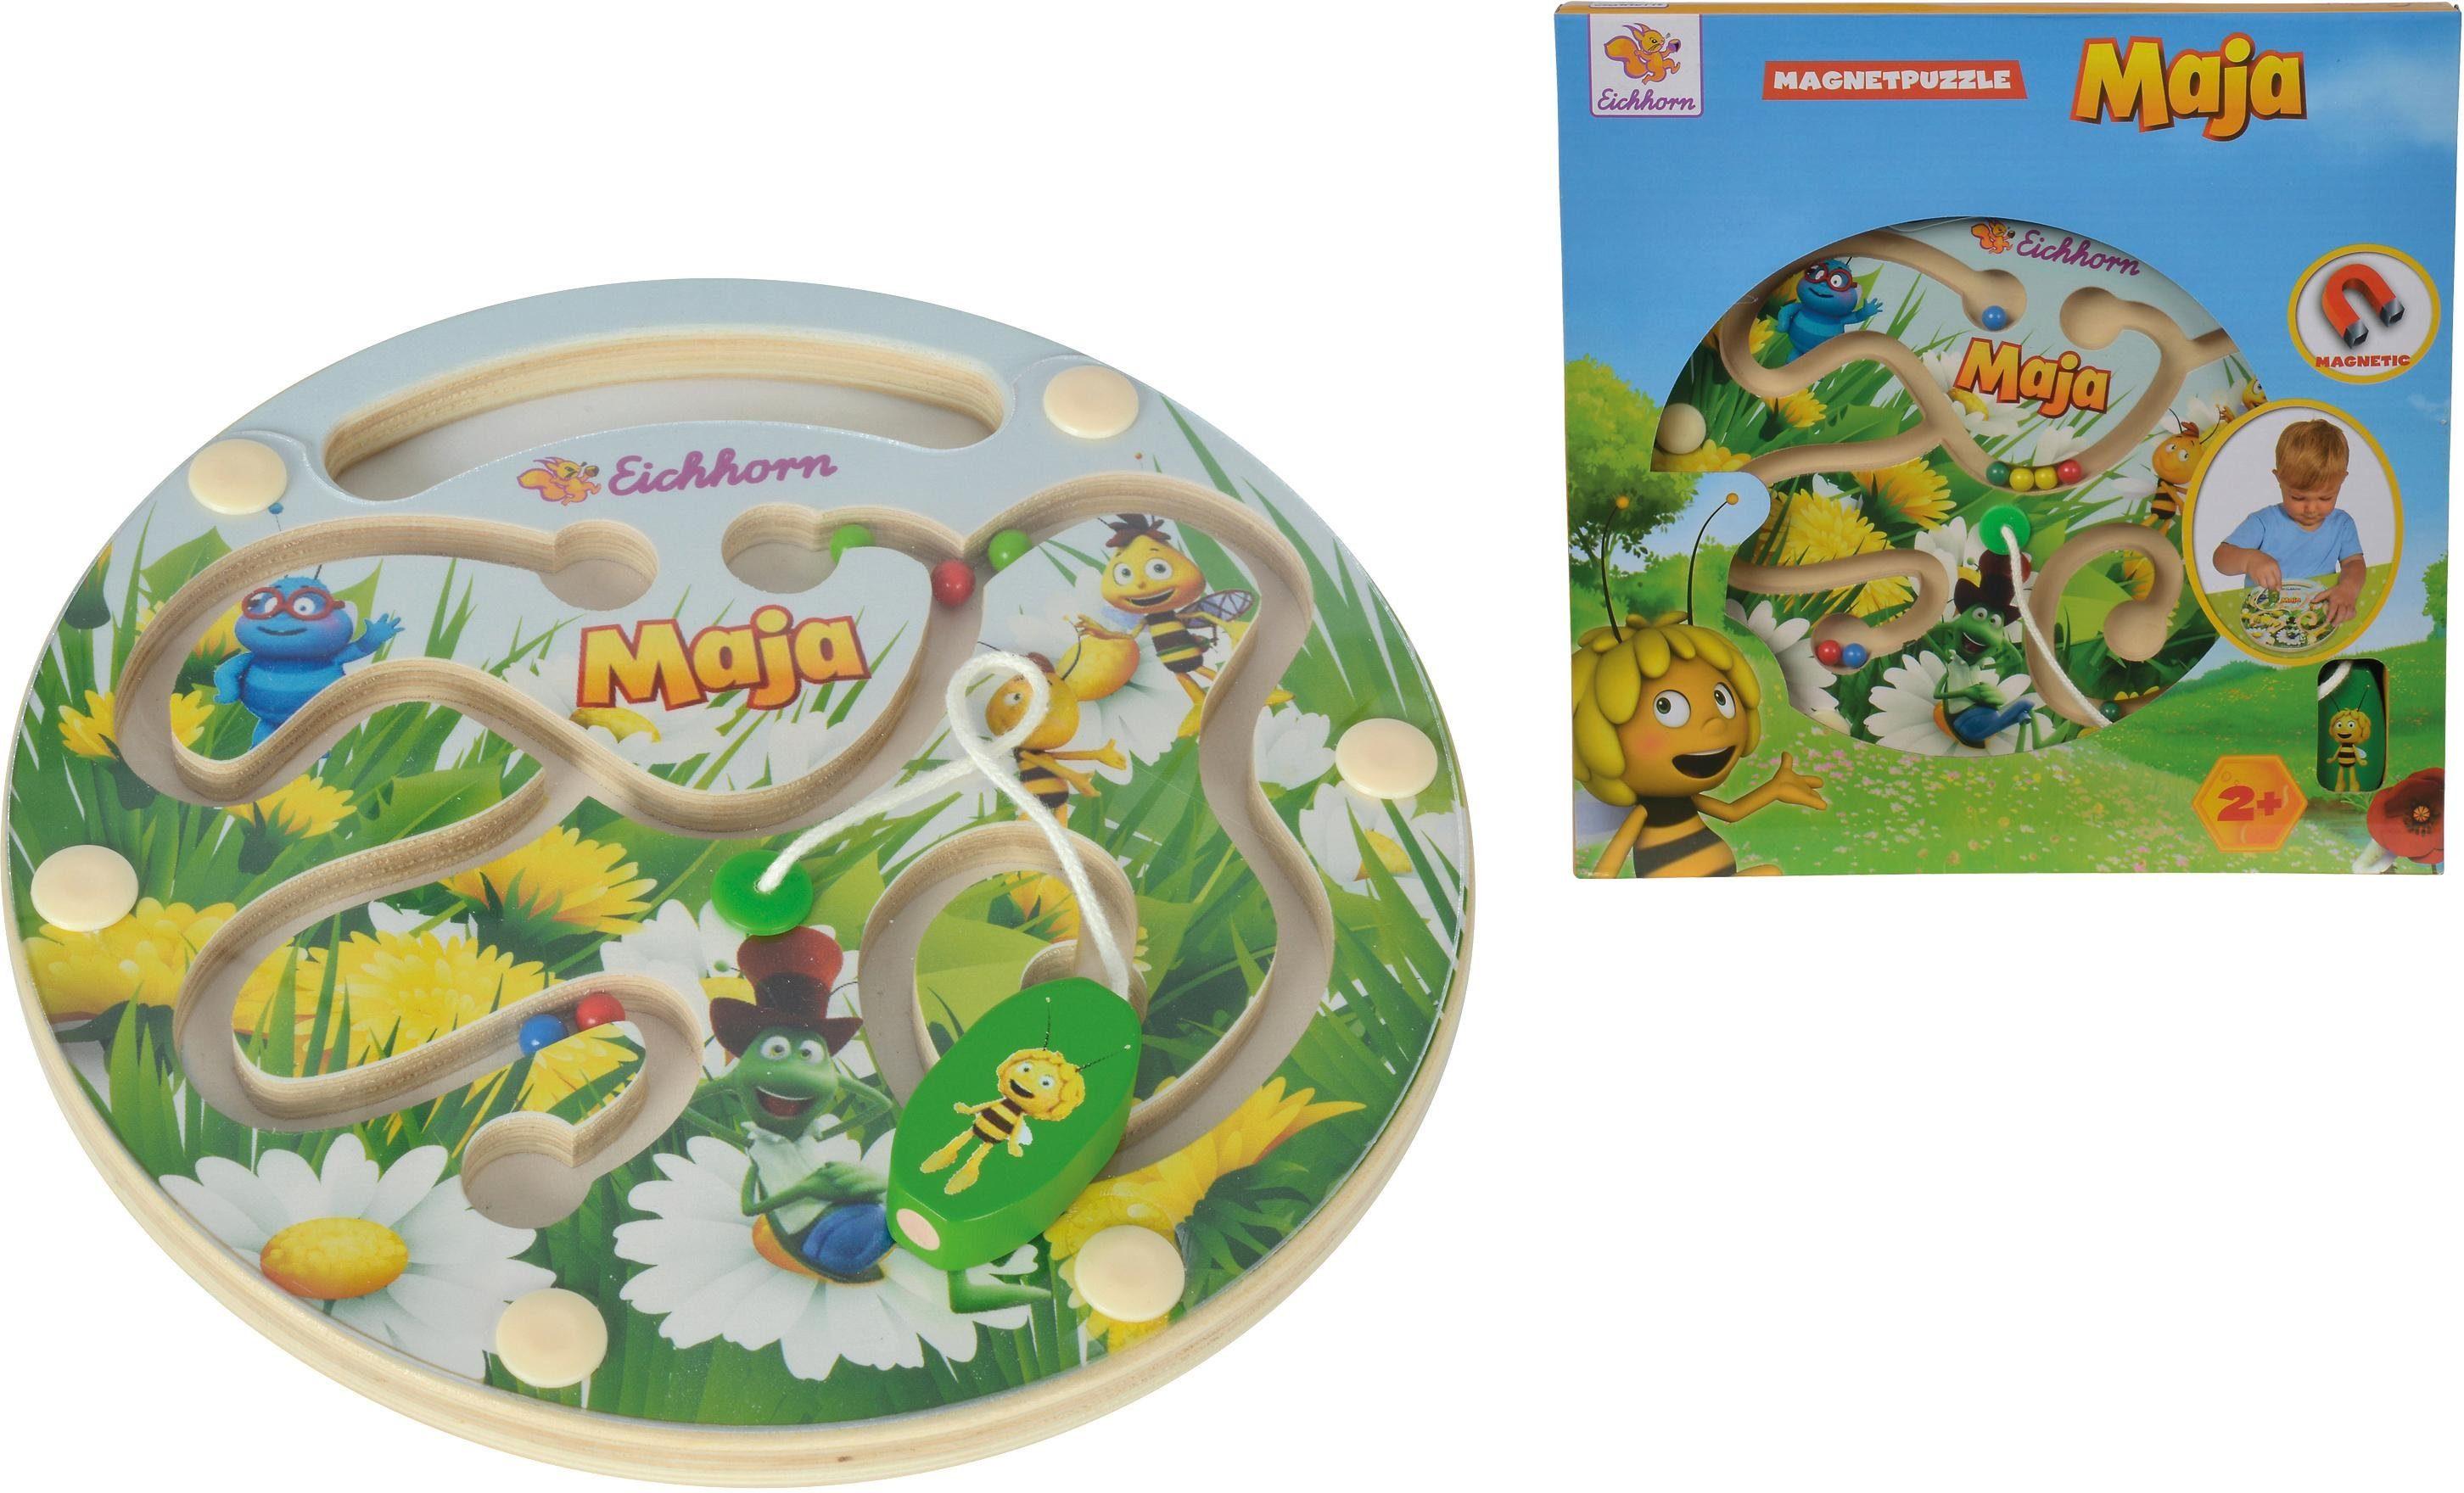 Eichhorn Magnetspiel aus Holz, »Biene Maja, Maja Magnetpuzzle«